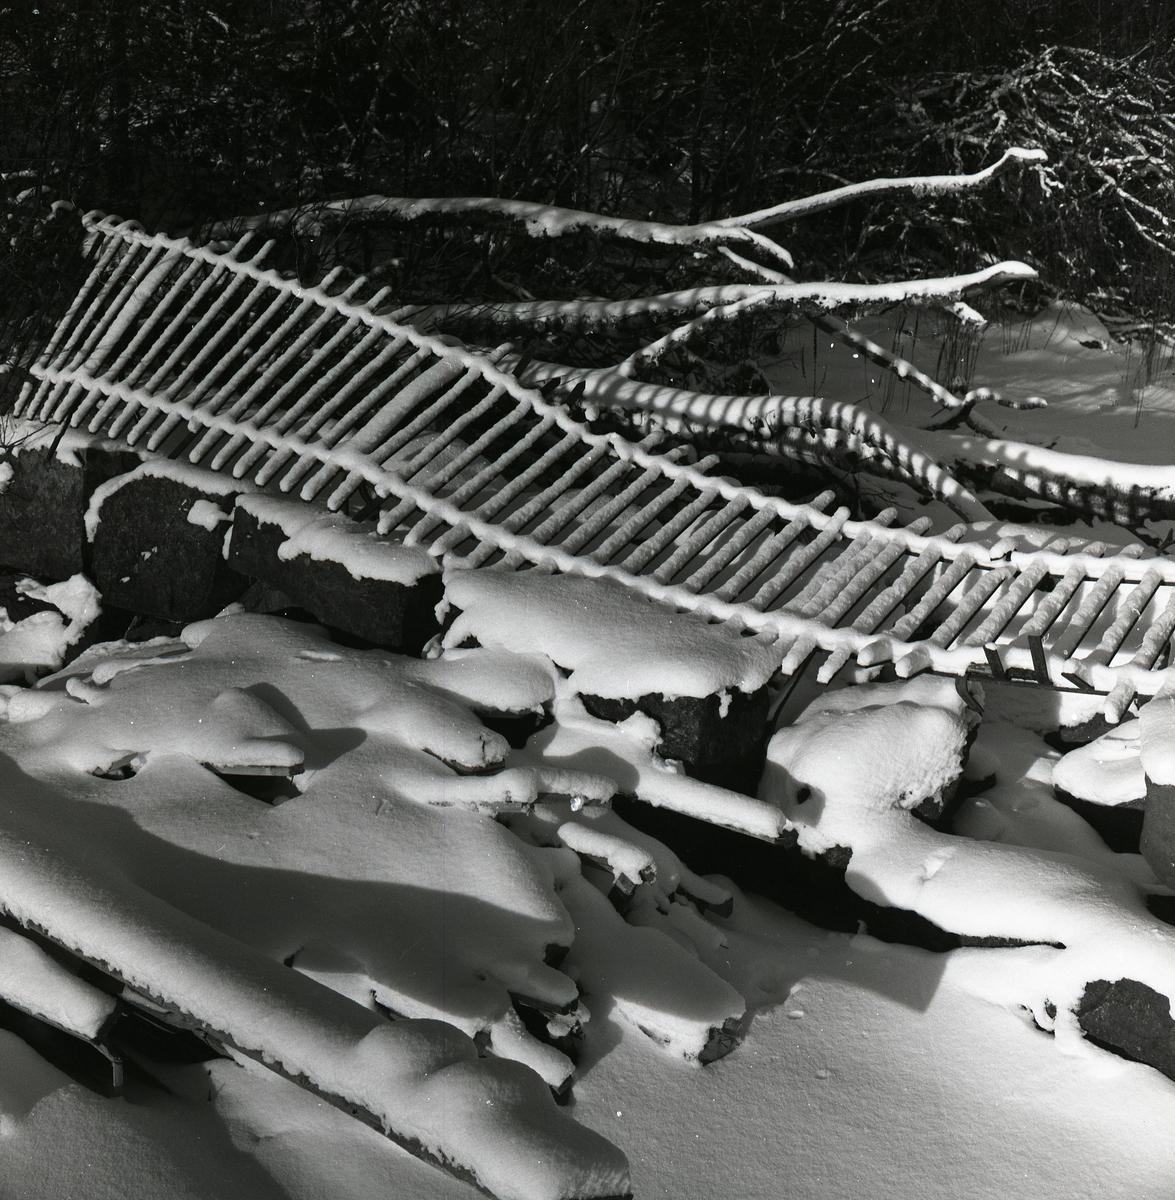 Snötäckt staket som fallit omkul i Lenninge, 31 januari 1960.